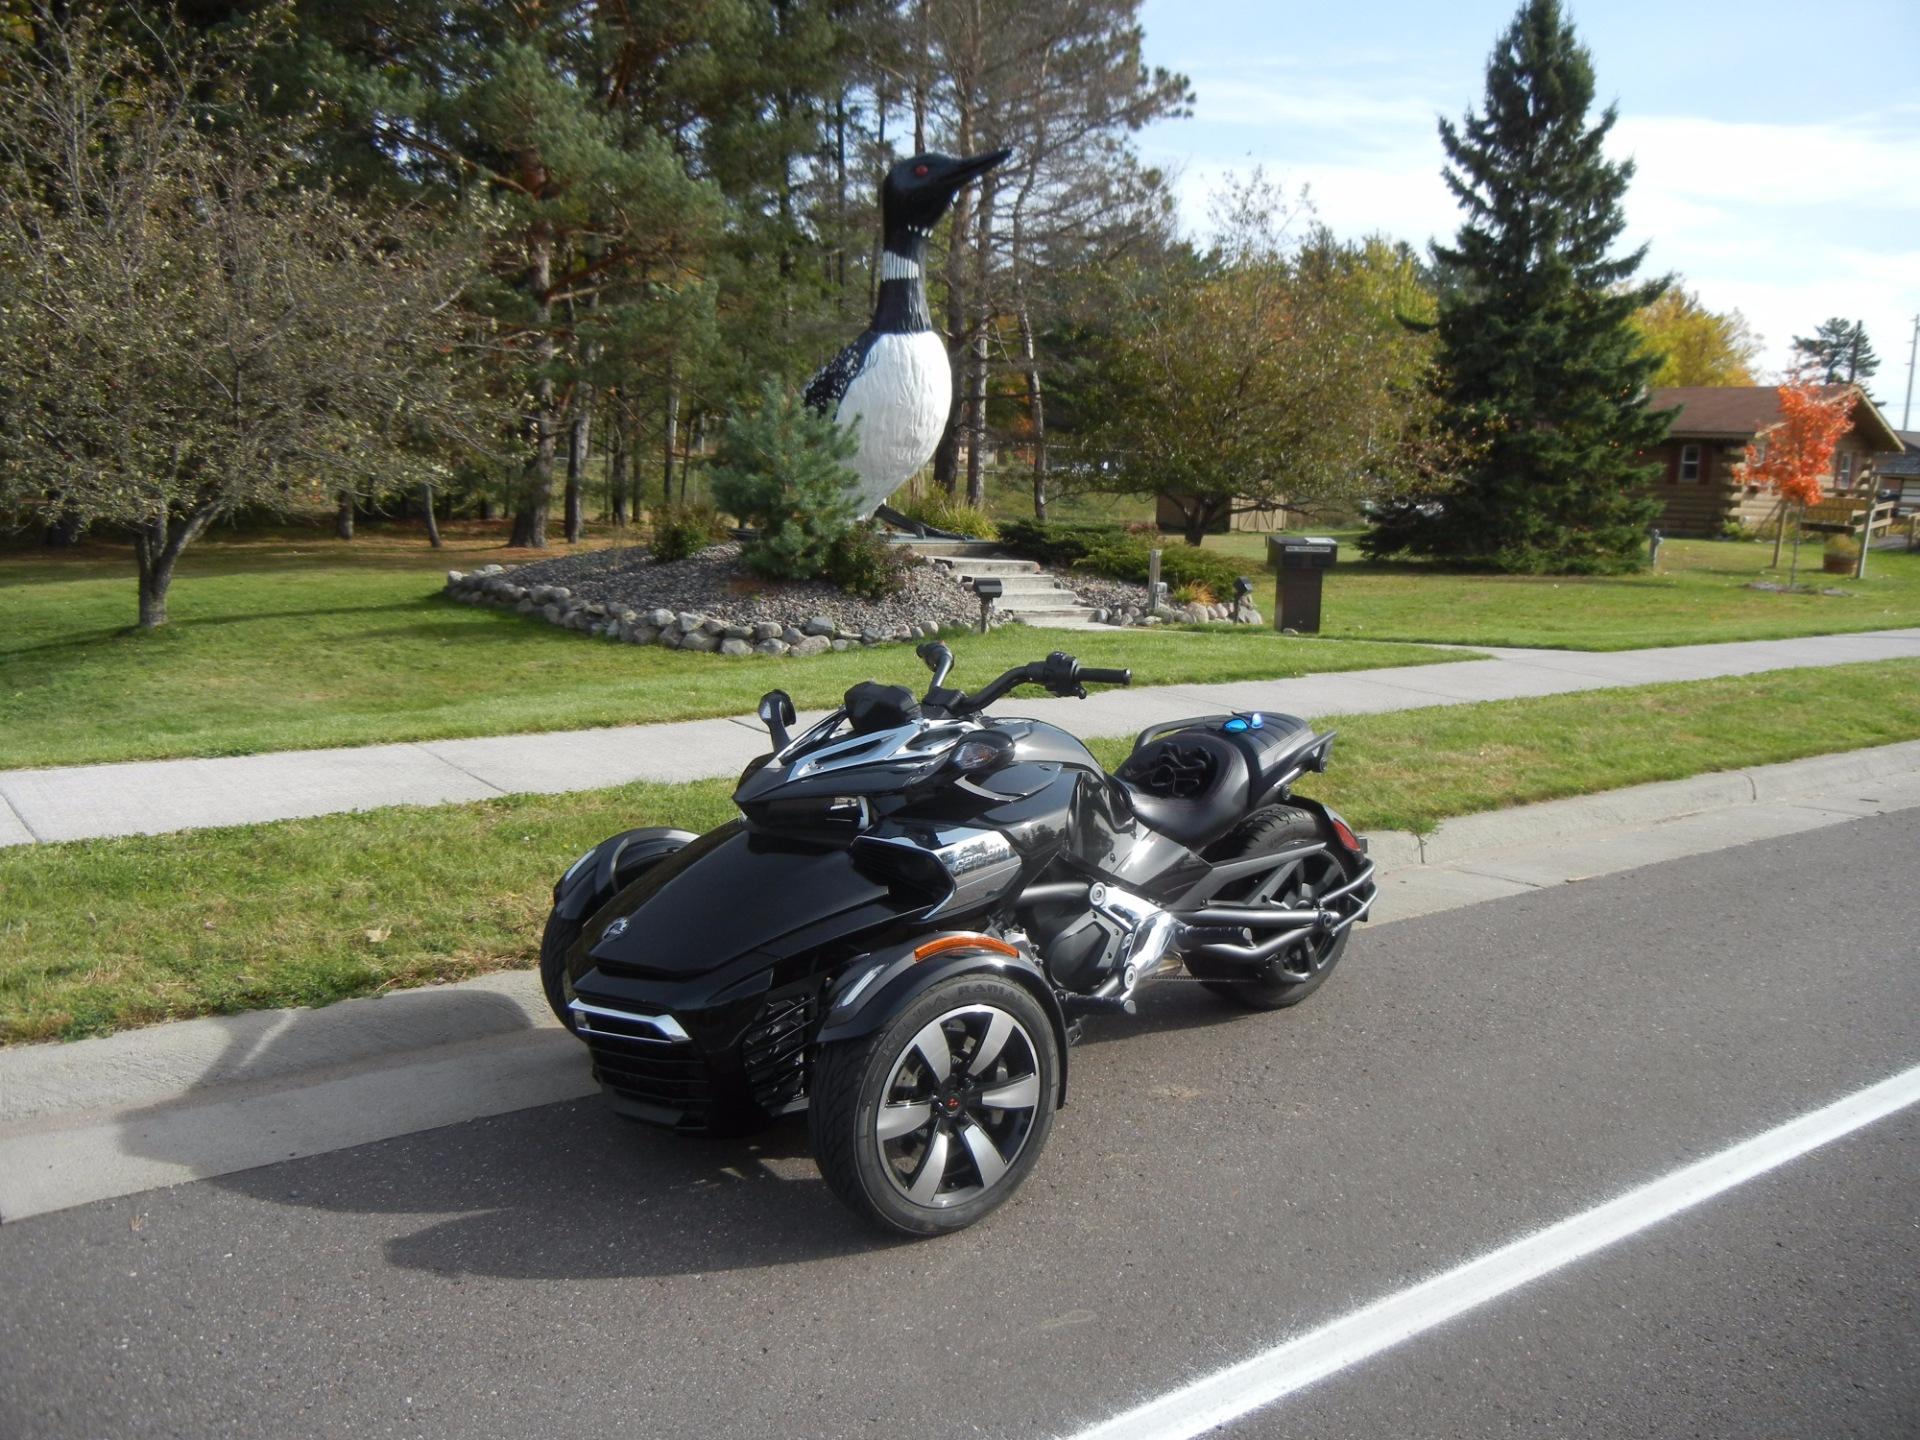 2015 Can-Am Spyder F3-S SE6 in Wisconsin Rapids, Wisconsin